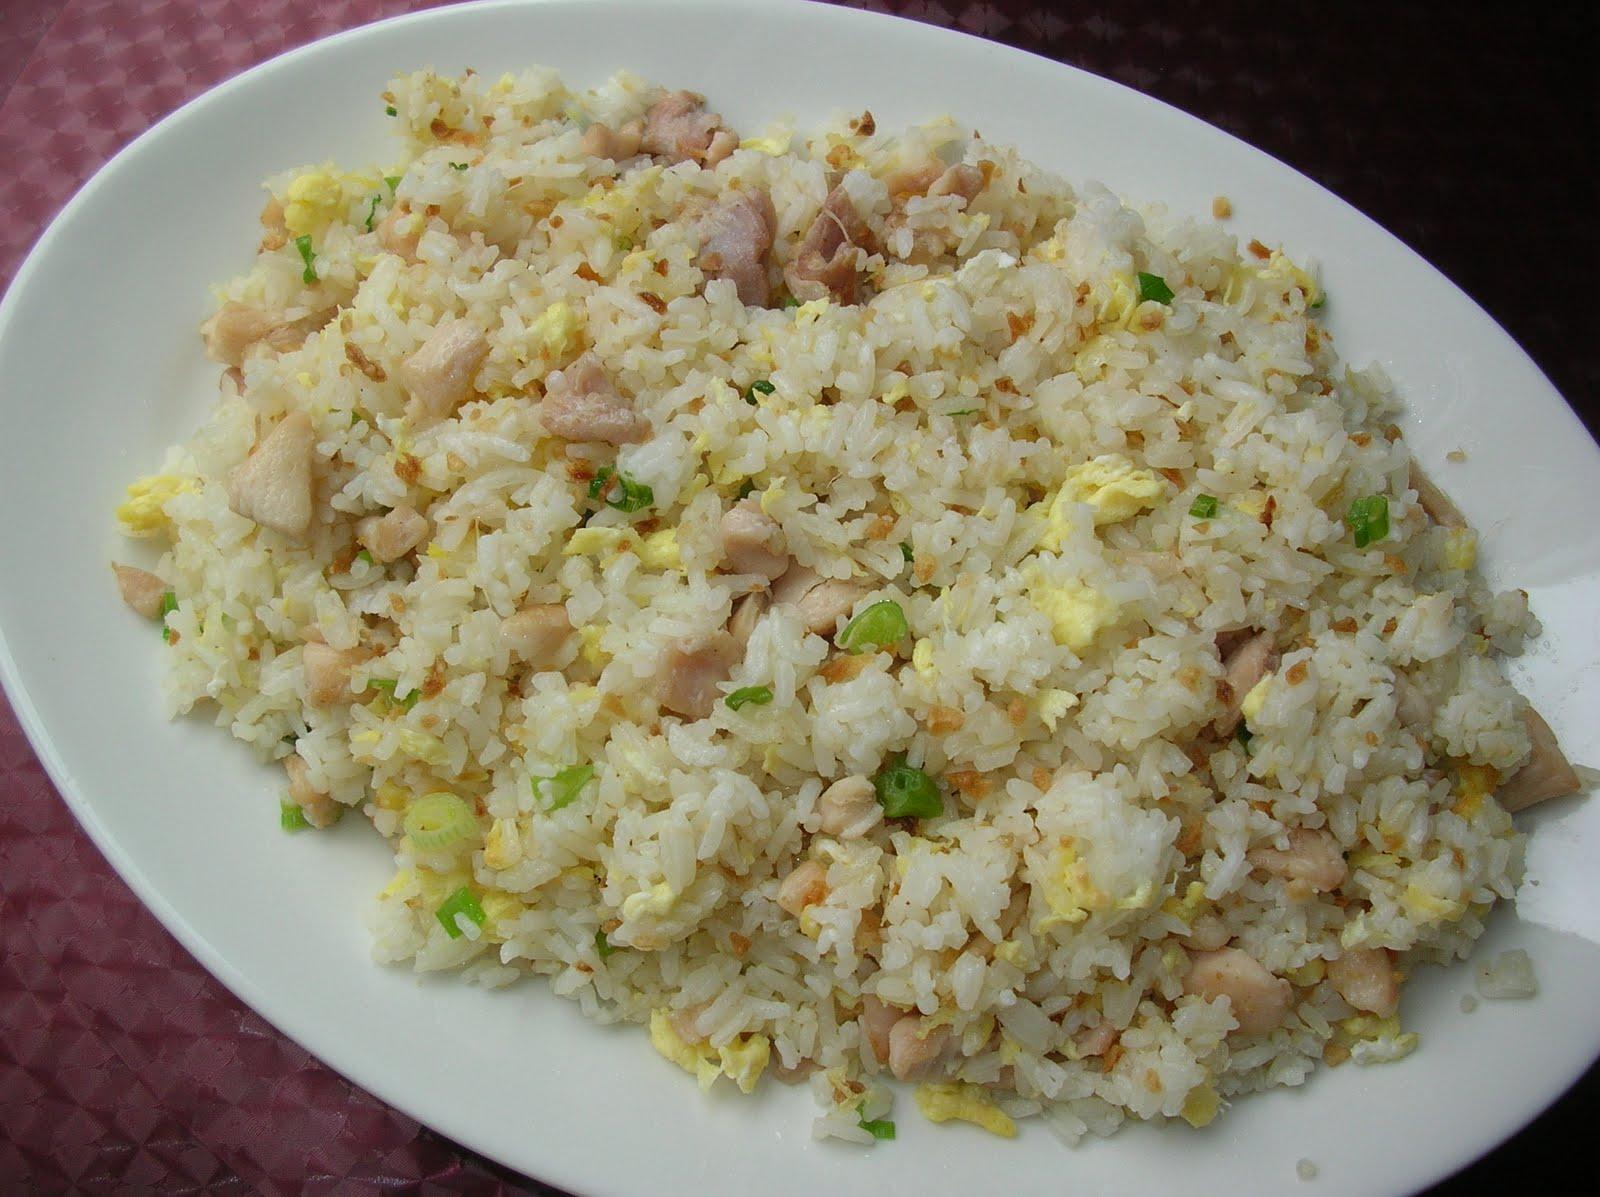 Loretta Simple Recipes: Garlic Chicken Fried Rice